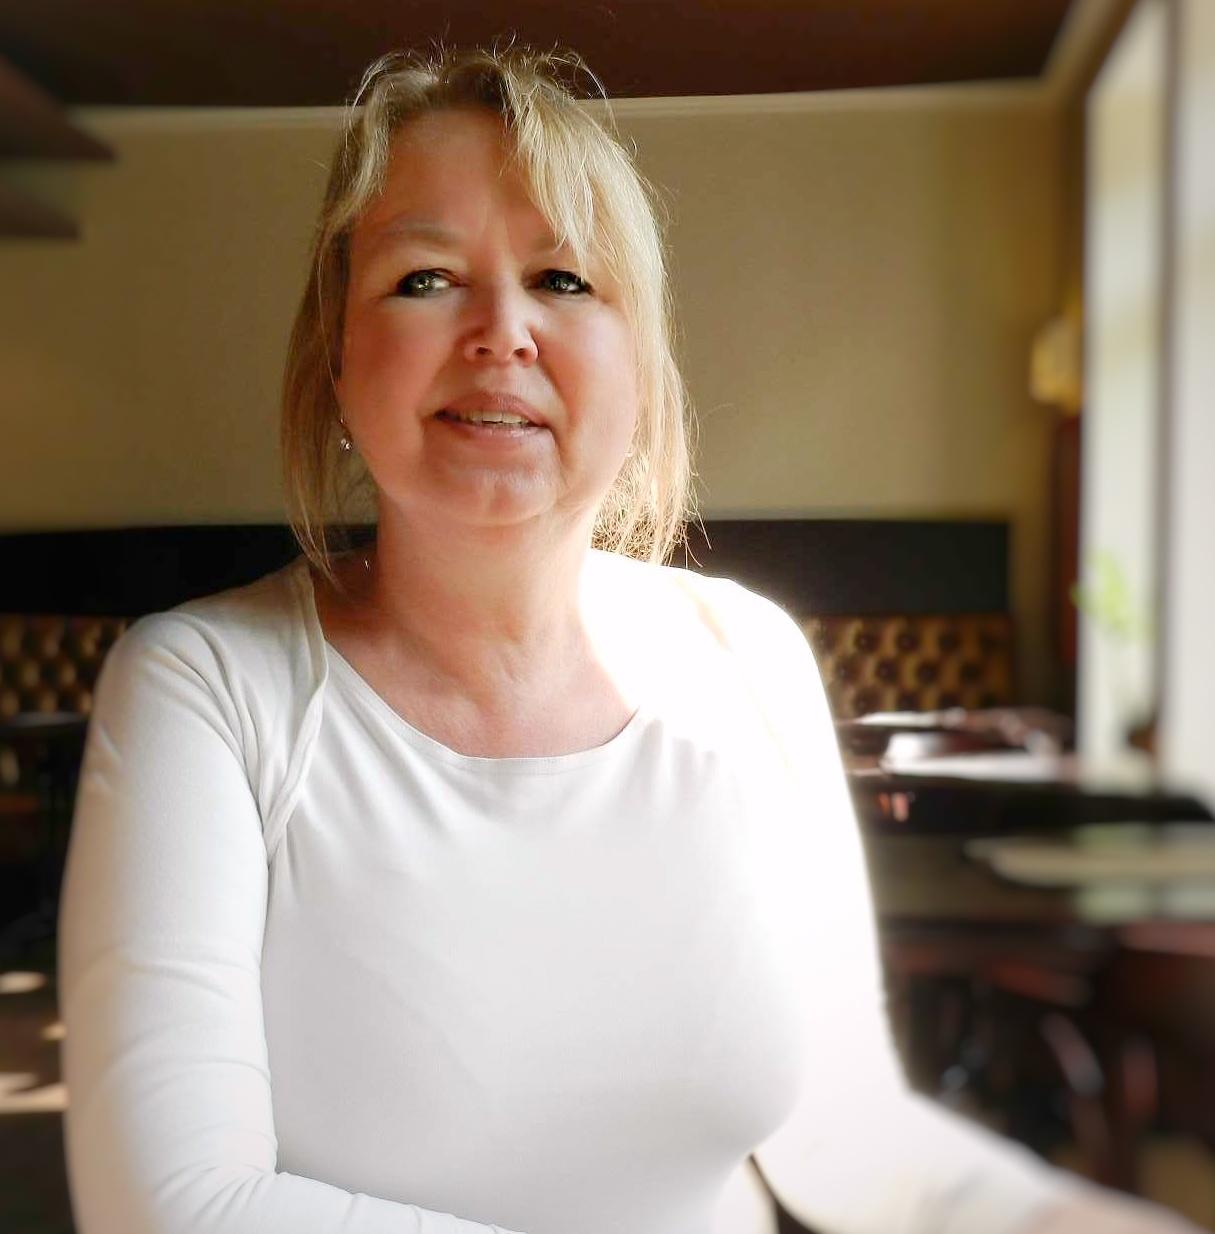 Manuela Kaps   Beraterin. Autorin. Coach   inspiration! Manuela Kaps, Frankfurt